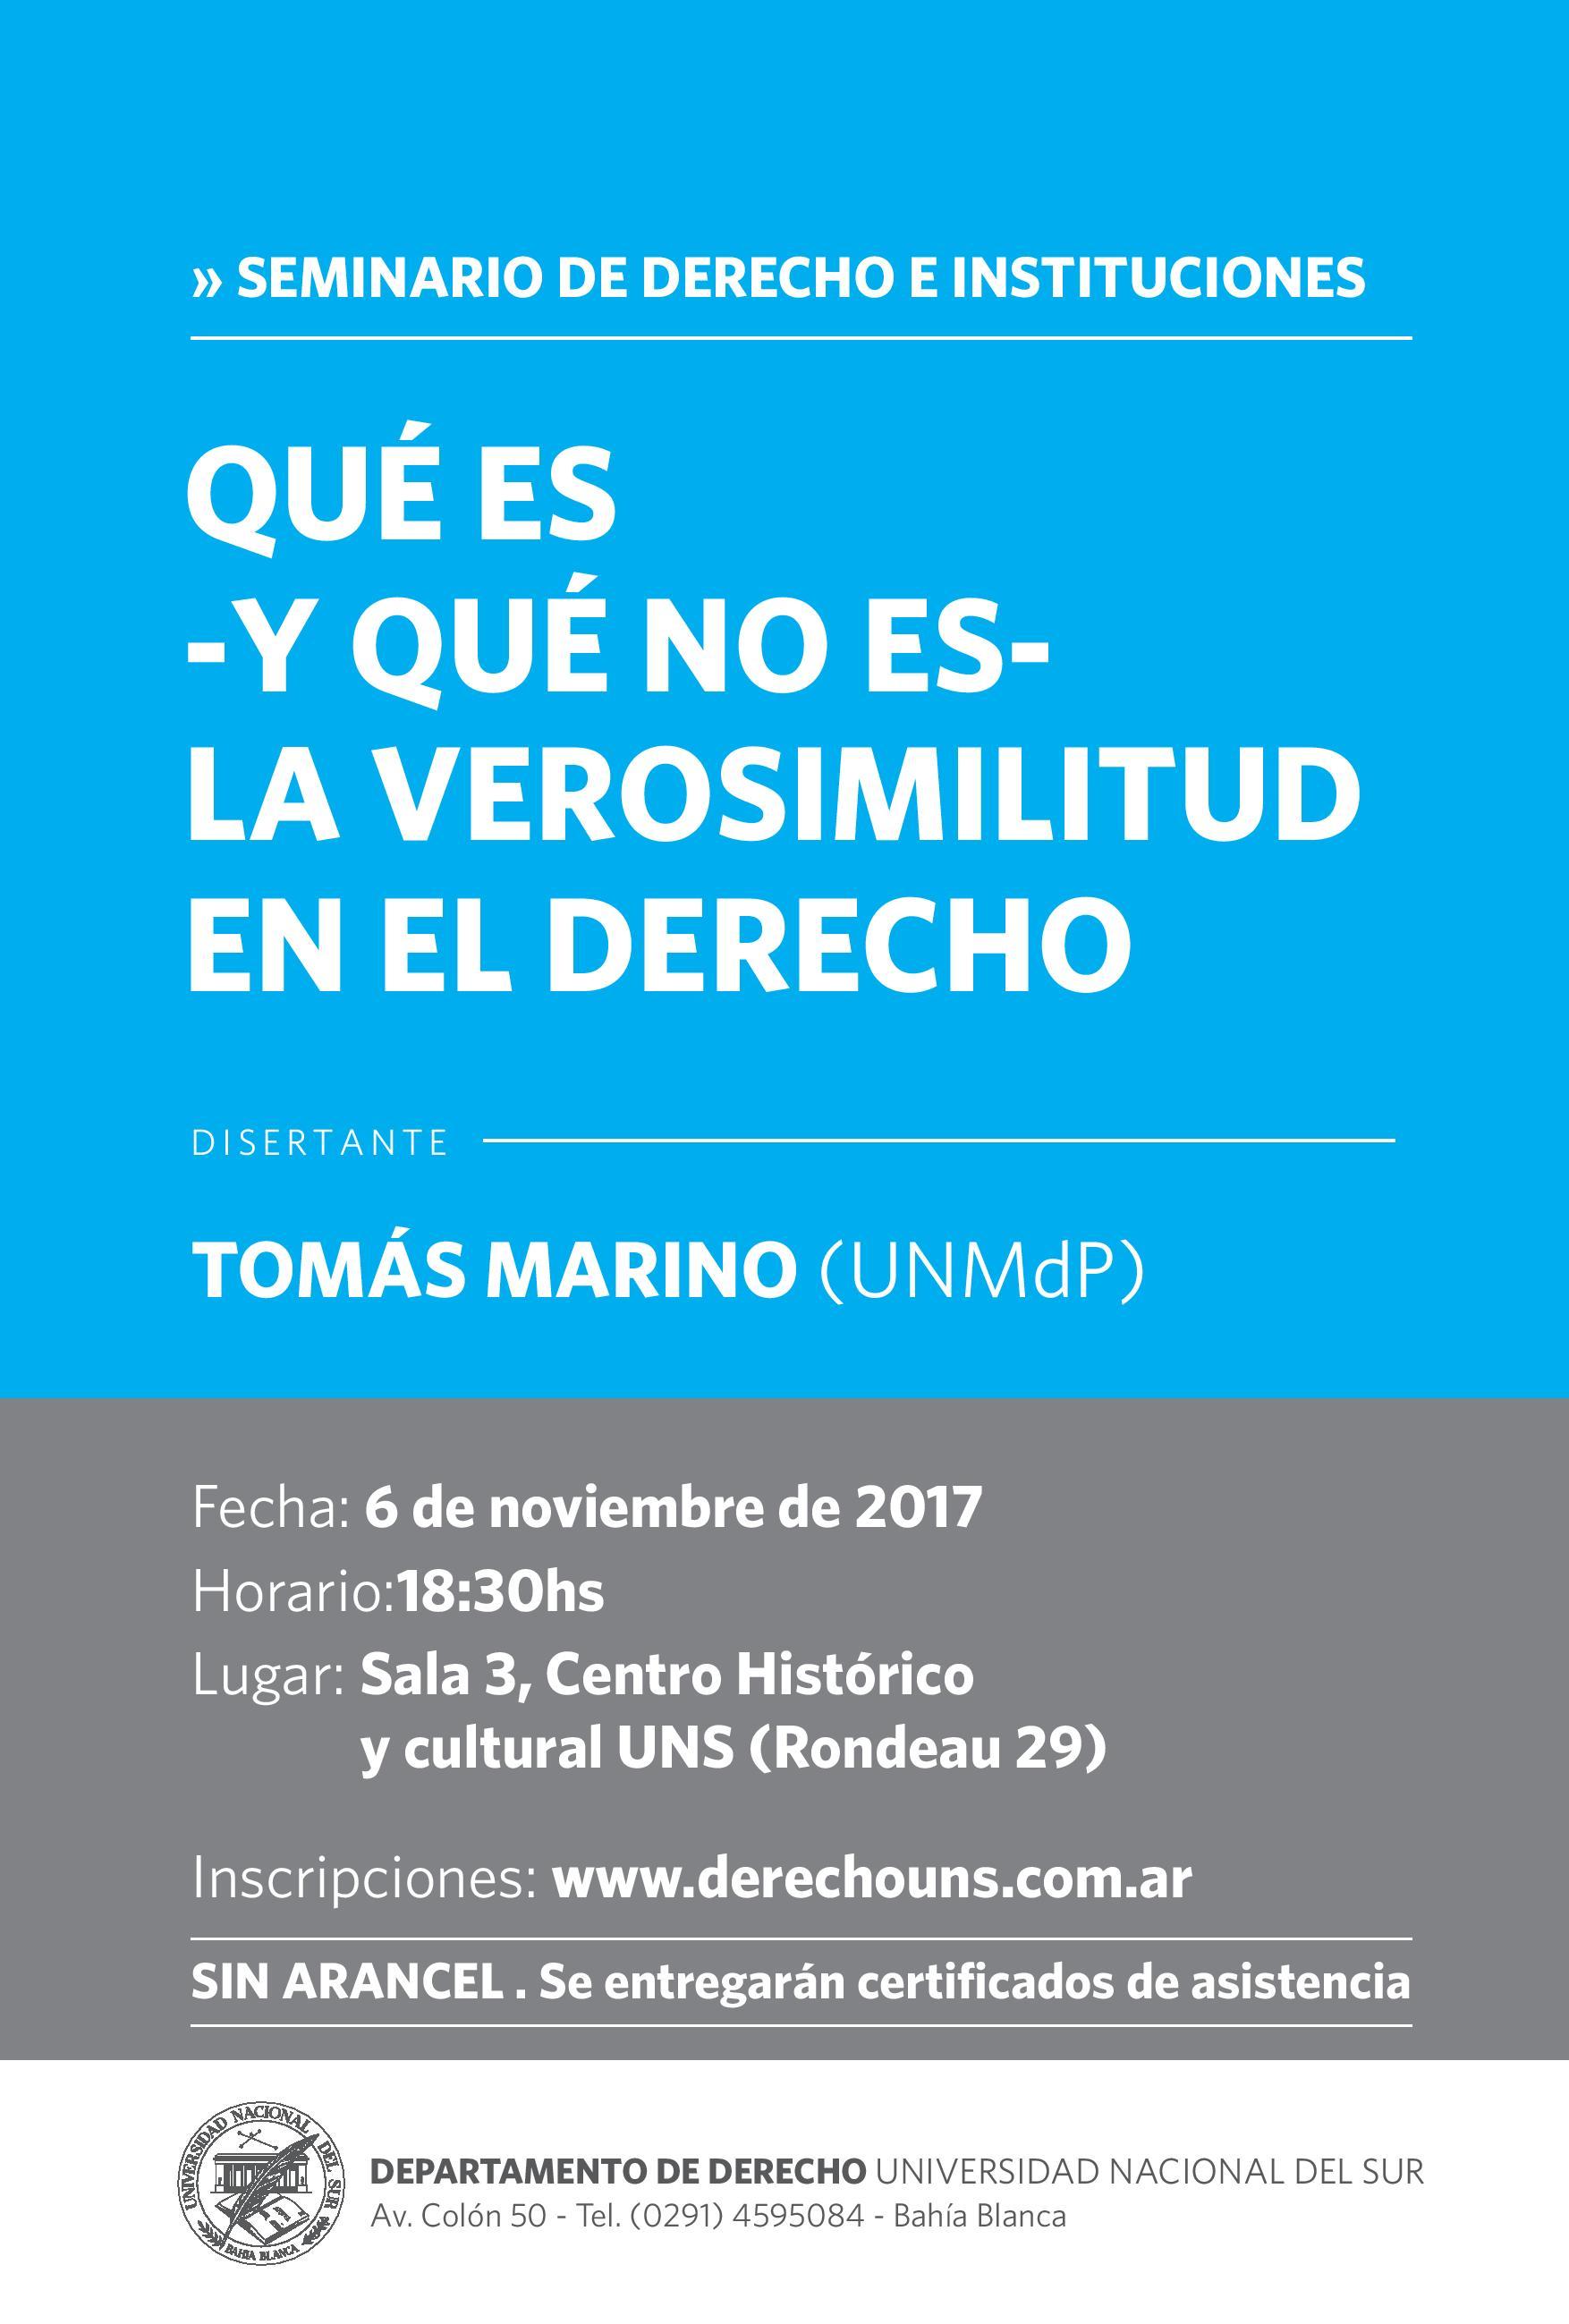 Derecho-e-Instituciones-Tomas-Marino